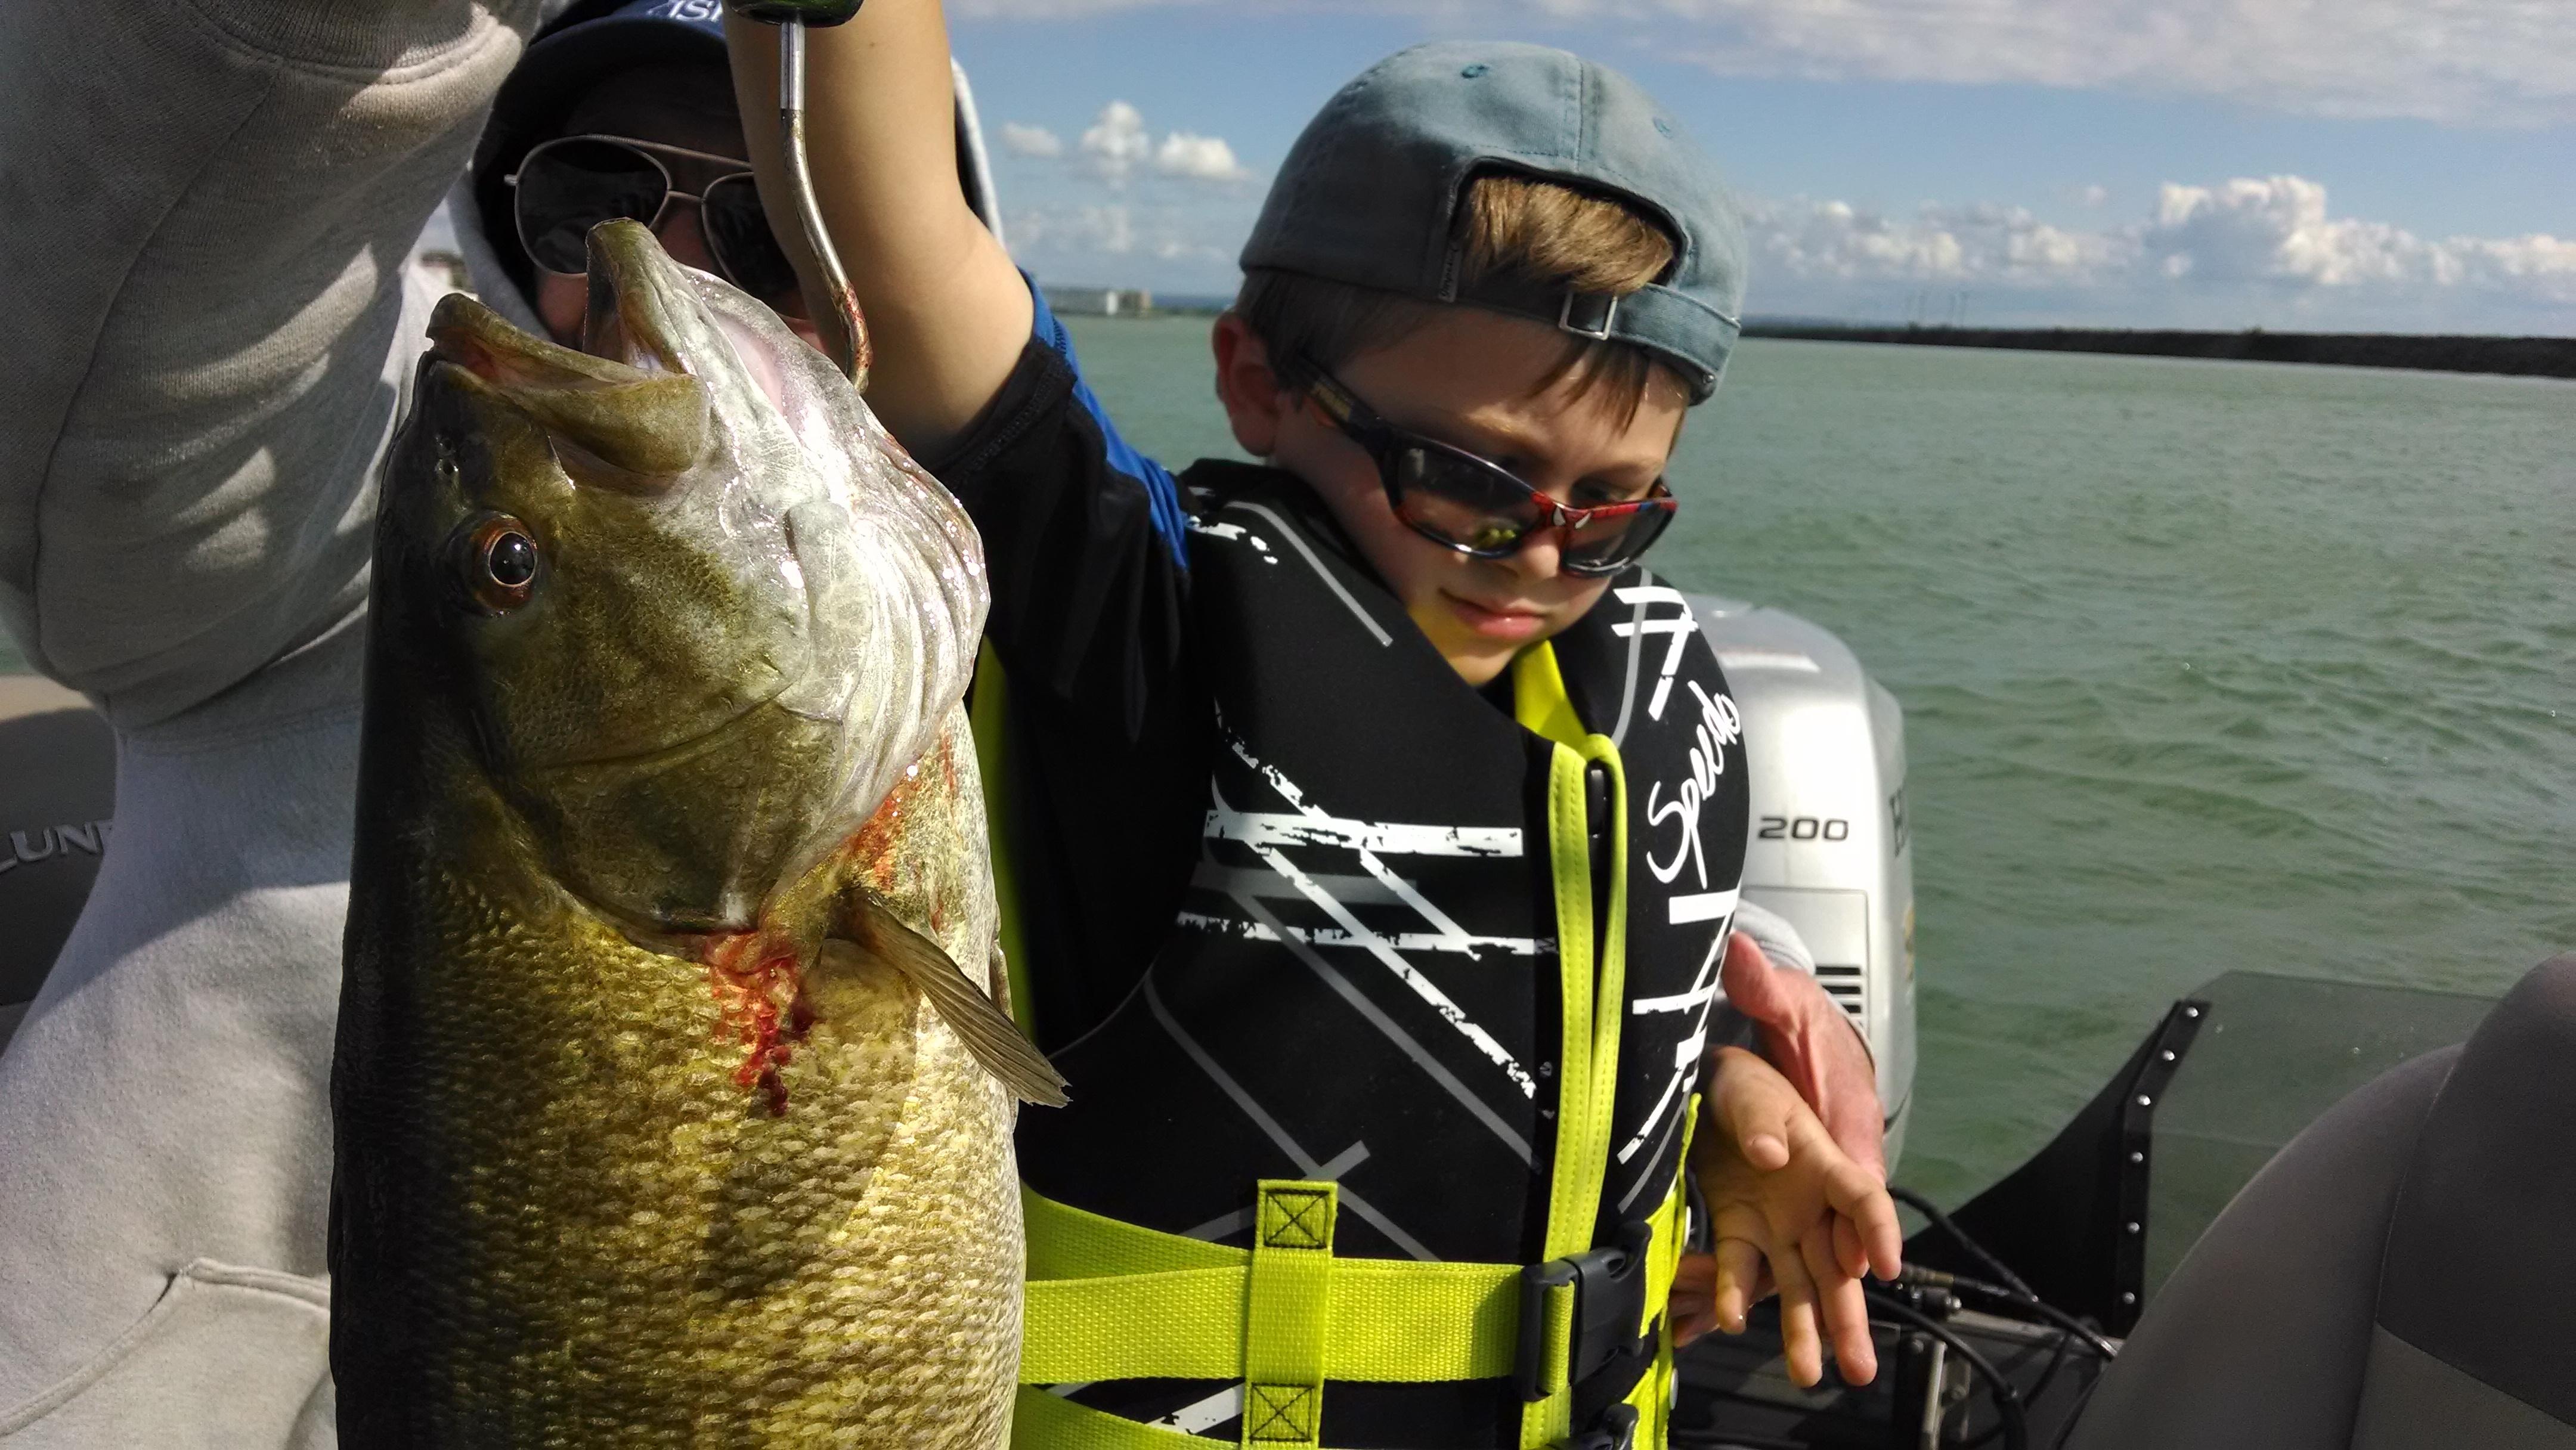 Drab6 fishing charters in lewiston ny 716 807 6 for Fishing charters buffalo ny